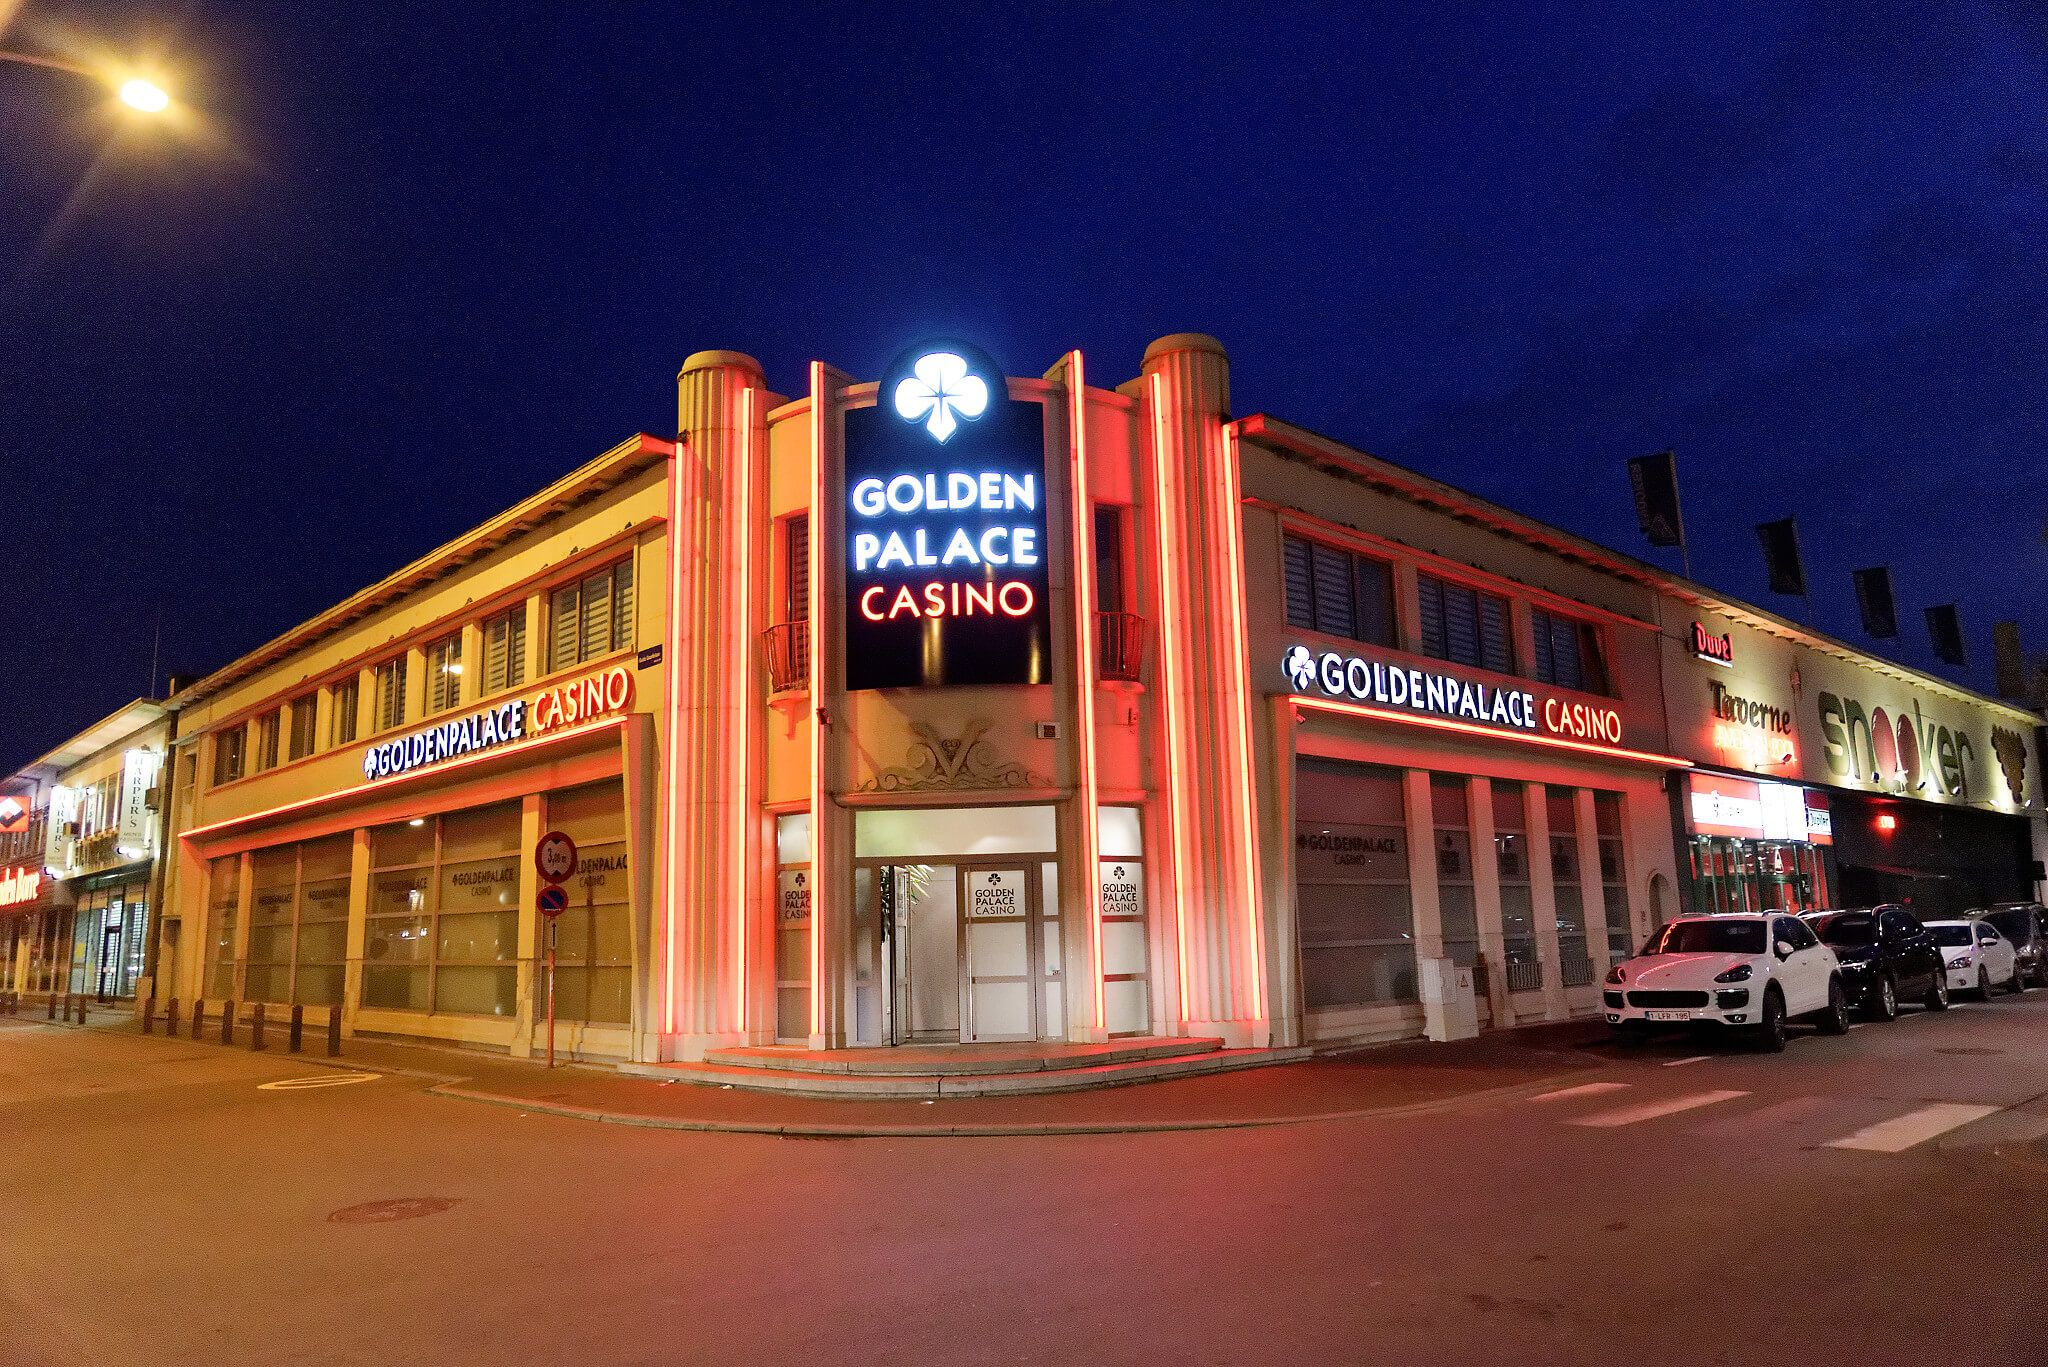 Dover downs casino bonus play single sign on